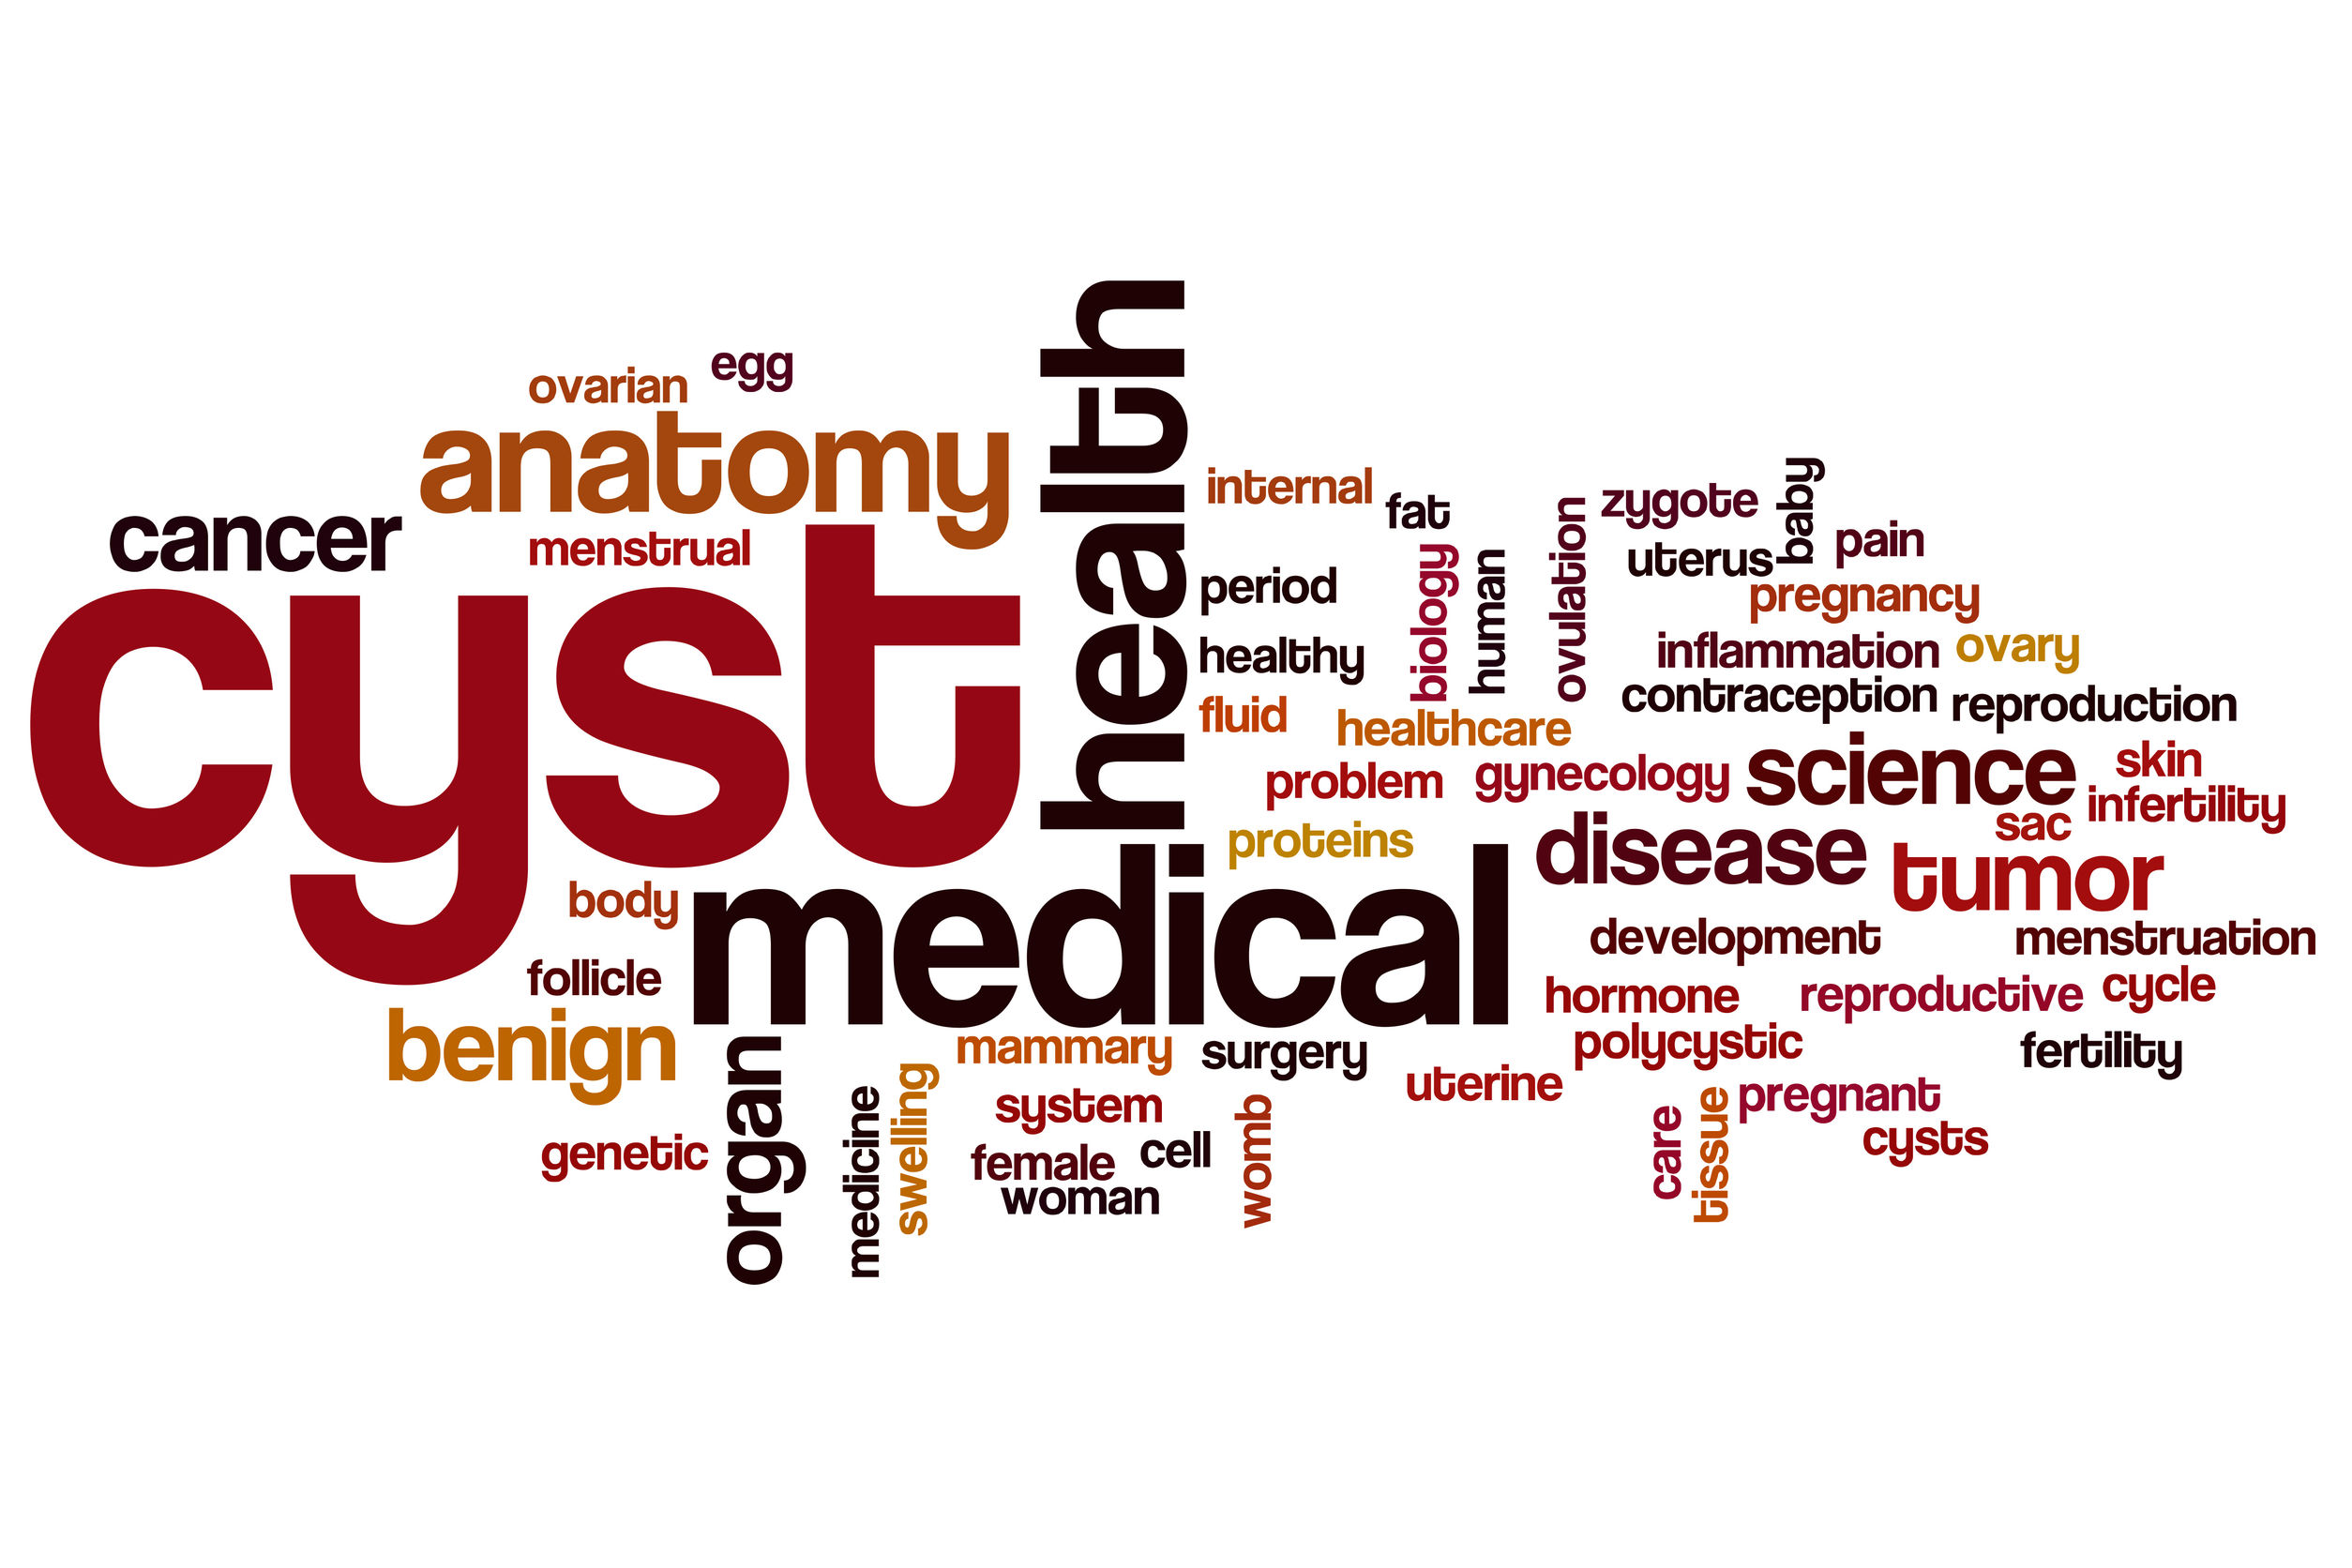 Ovarian Cysts image